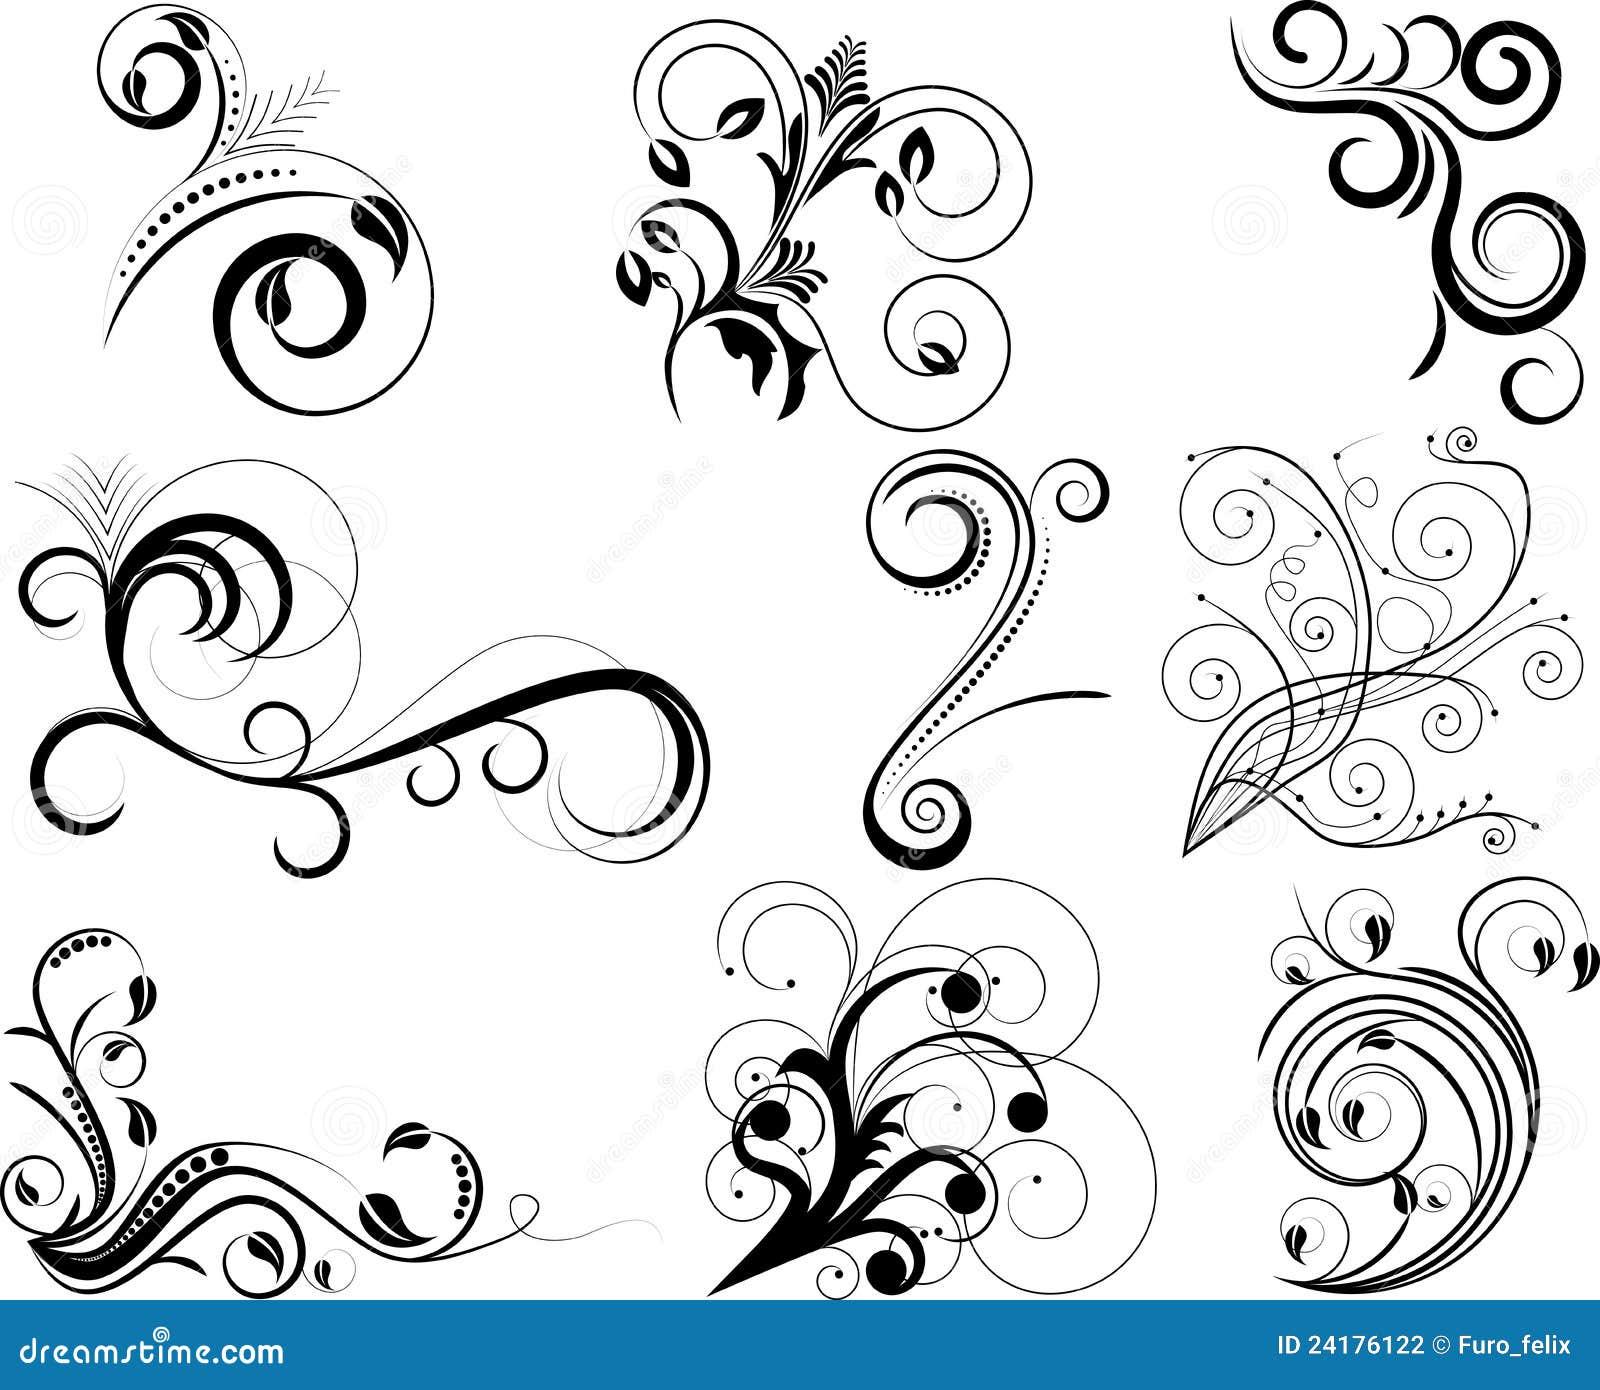 Swirl Elements Stock Photography Image 24176122